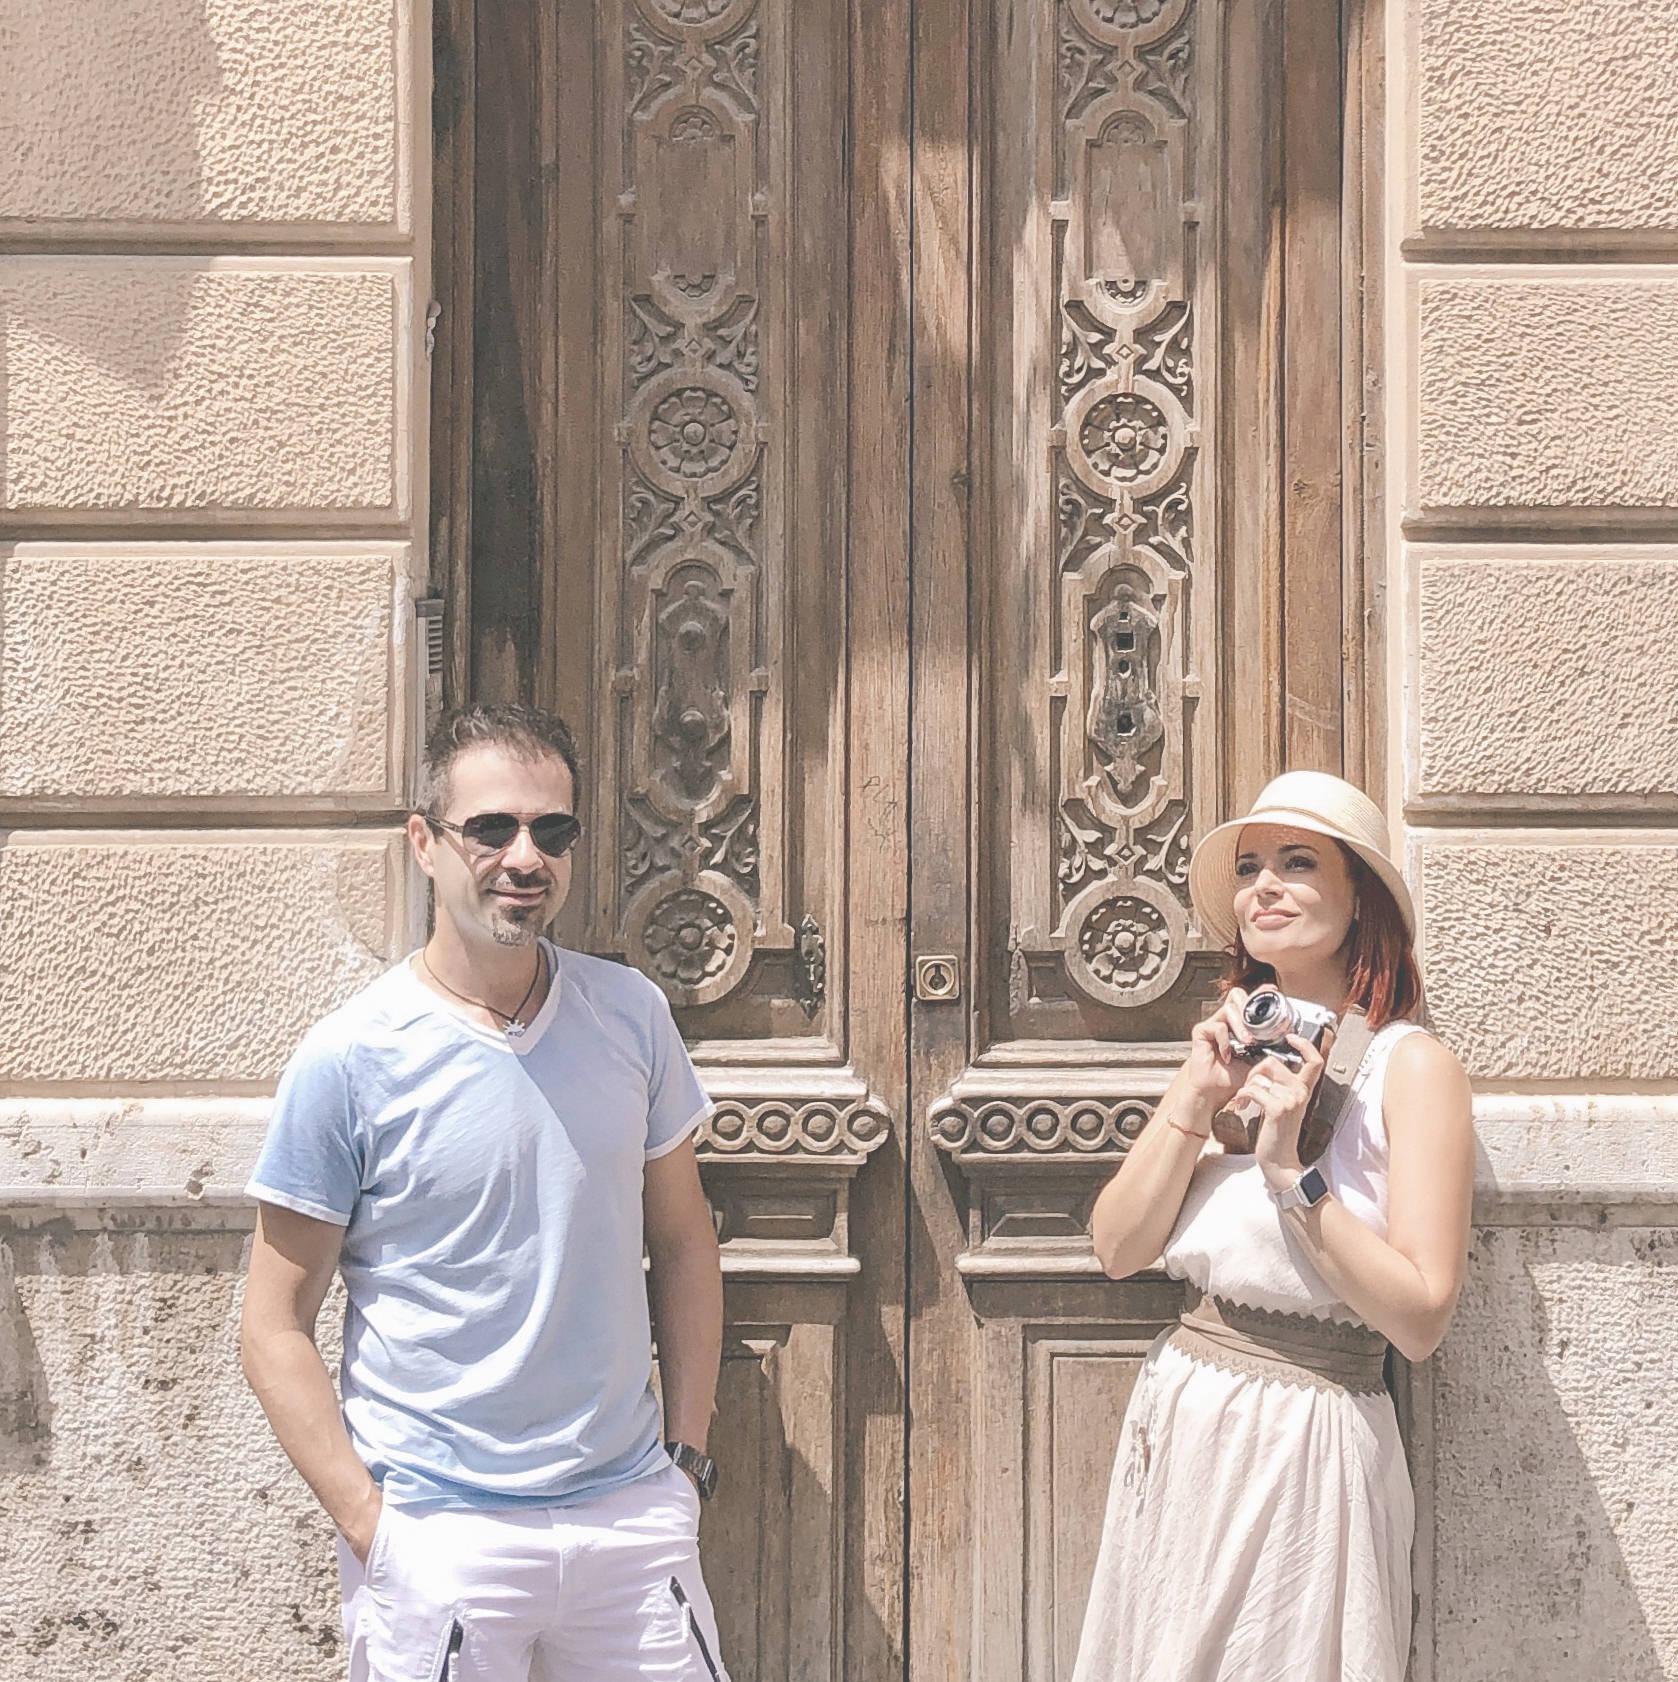 Plamen and Paulina Blagoev